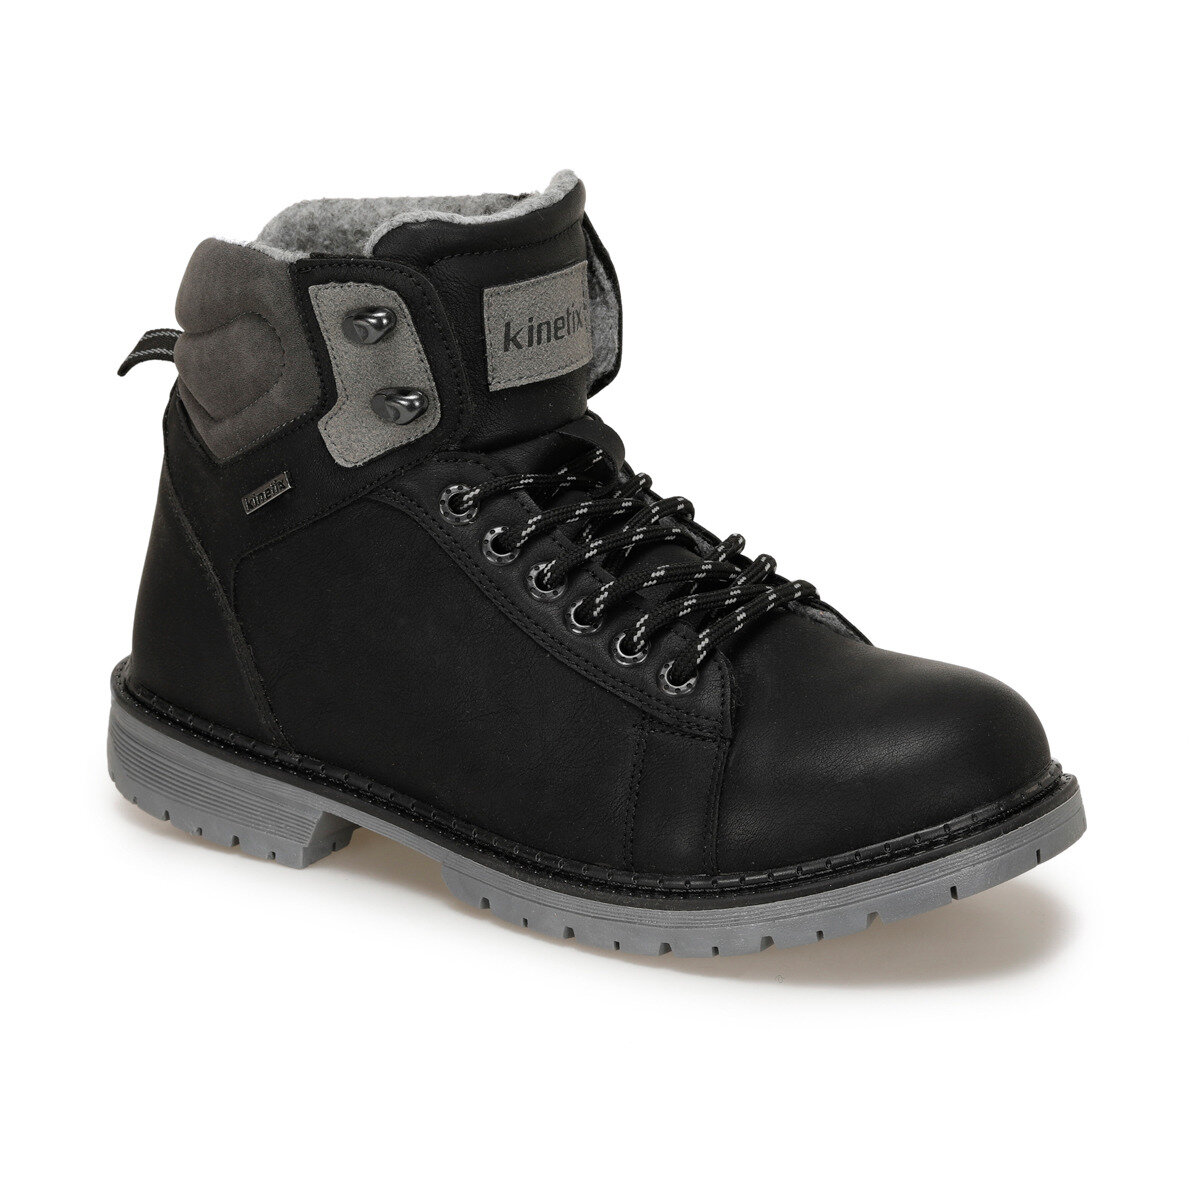 FLO 71422 1 Brown Men Boots Panama Club Basic Boots Shoes - title=